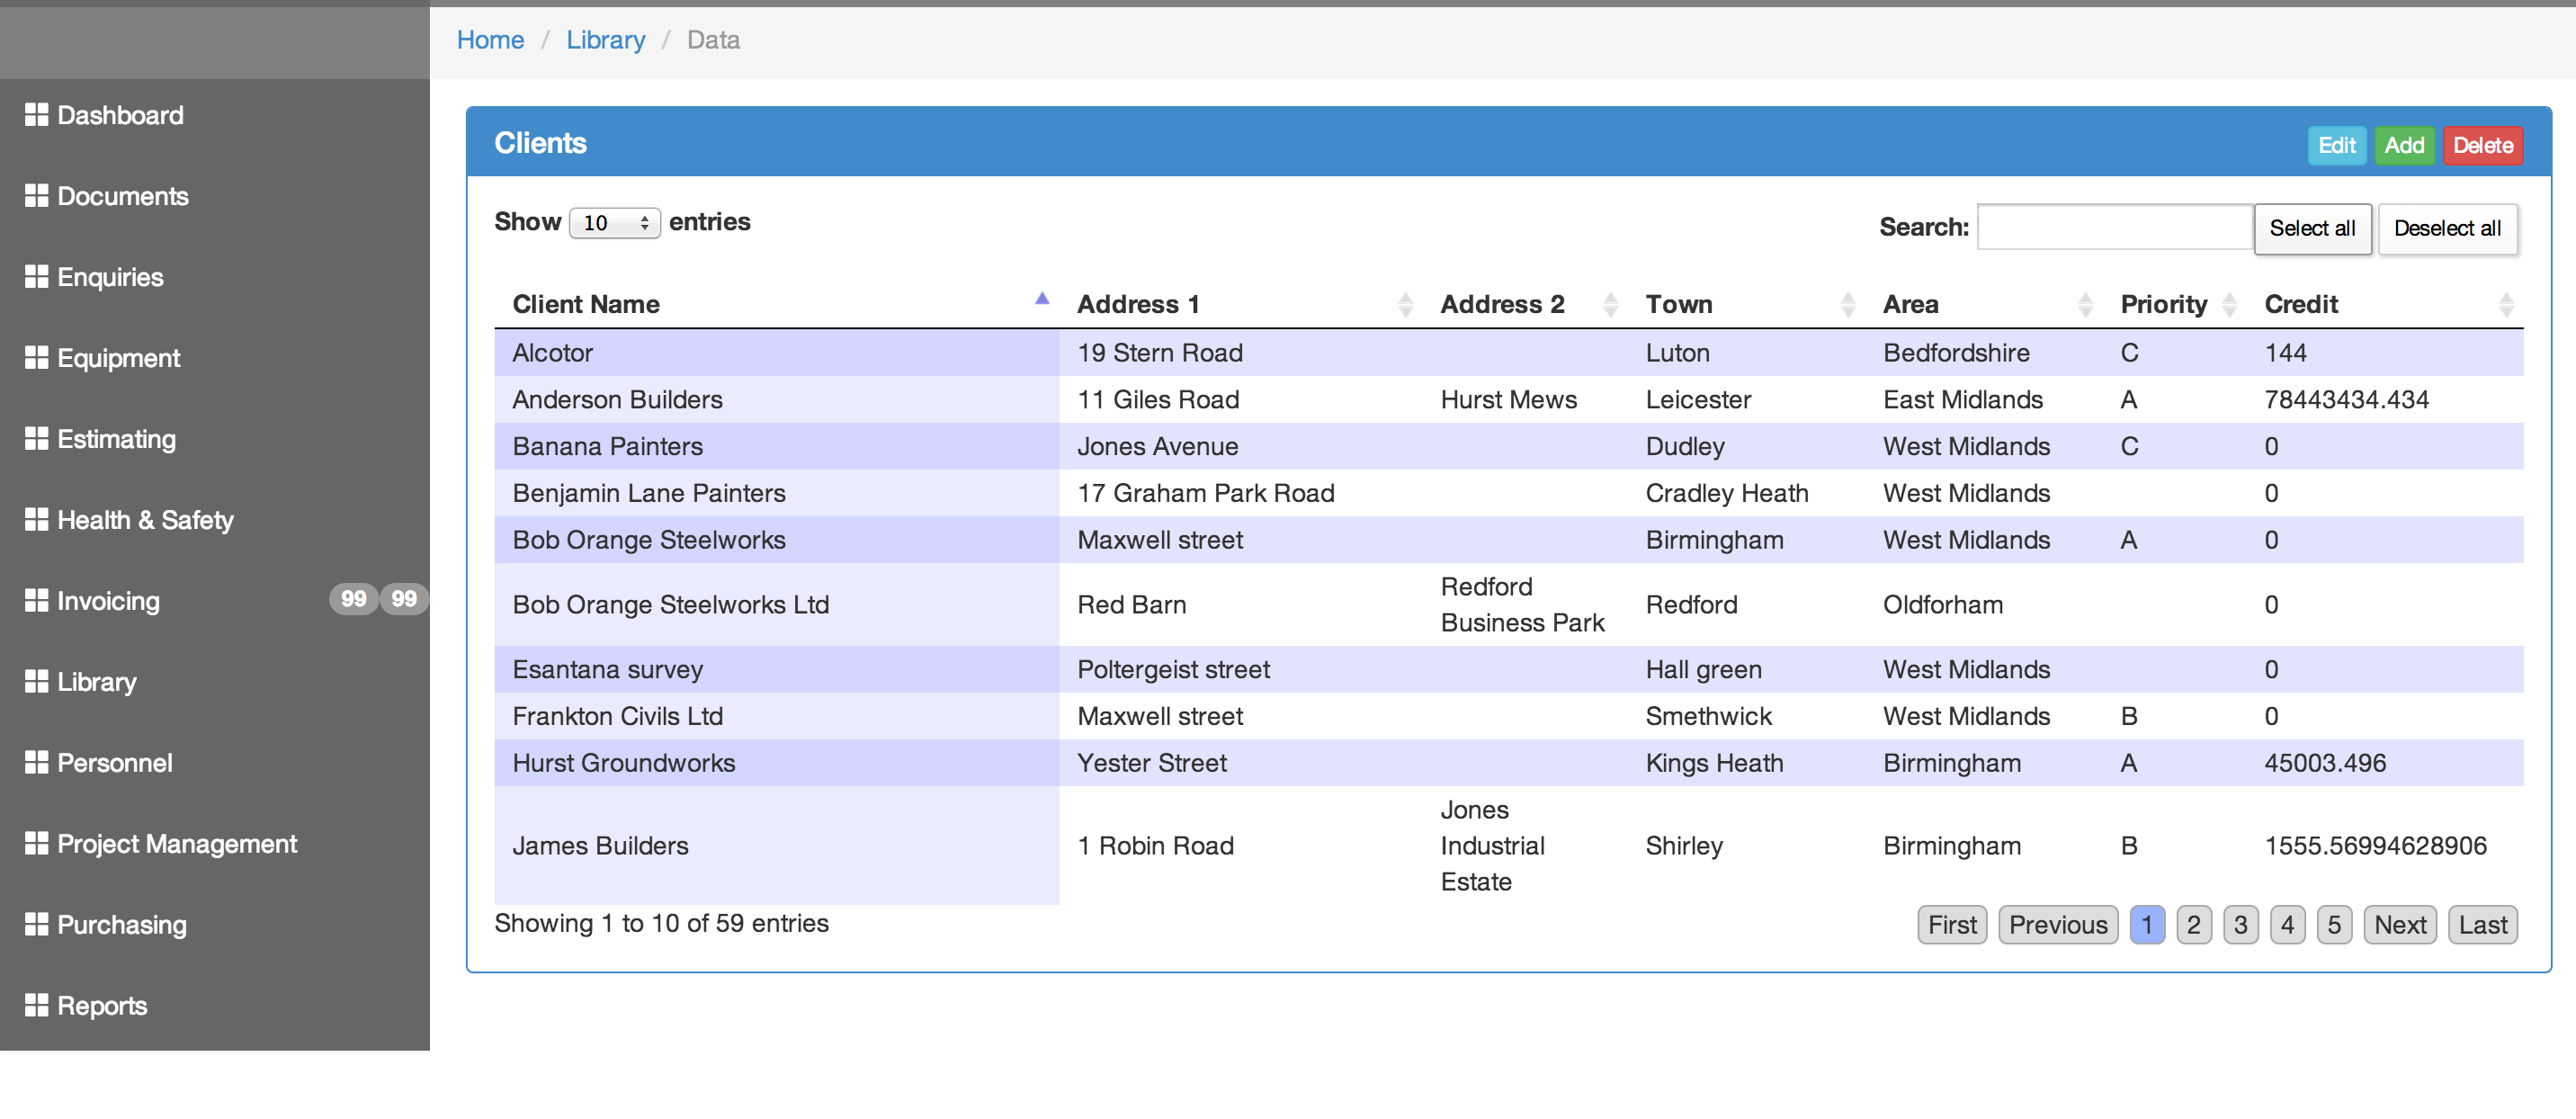 Datatables jQuery Format Problem